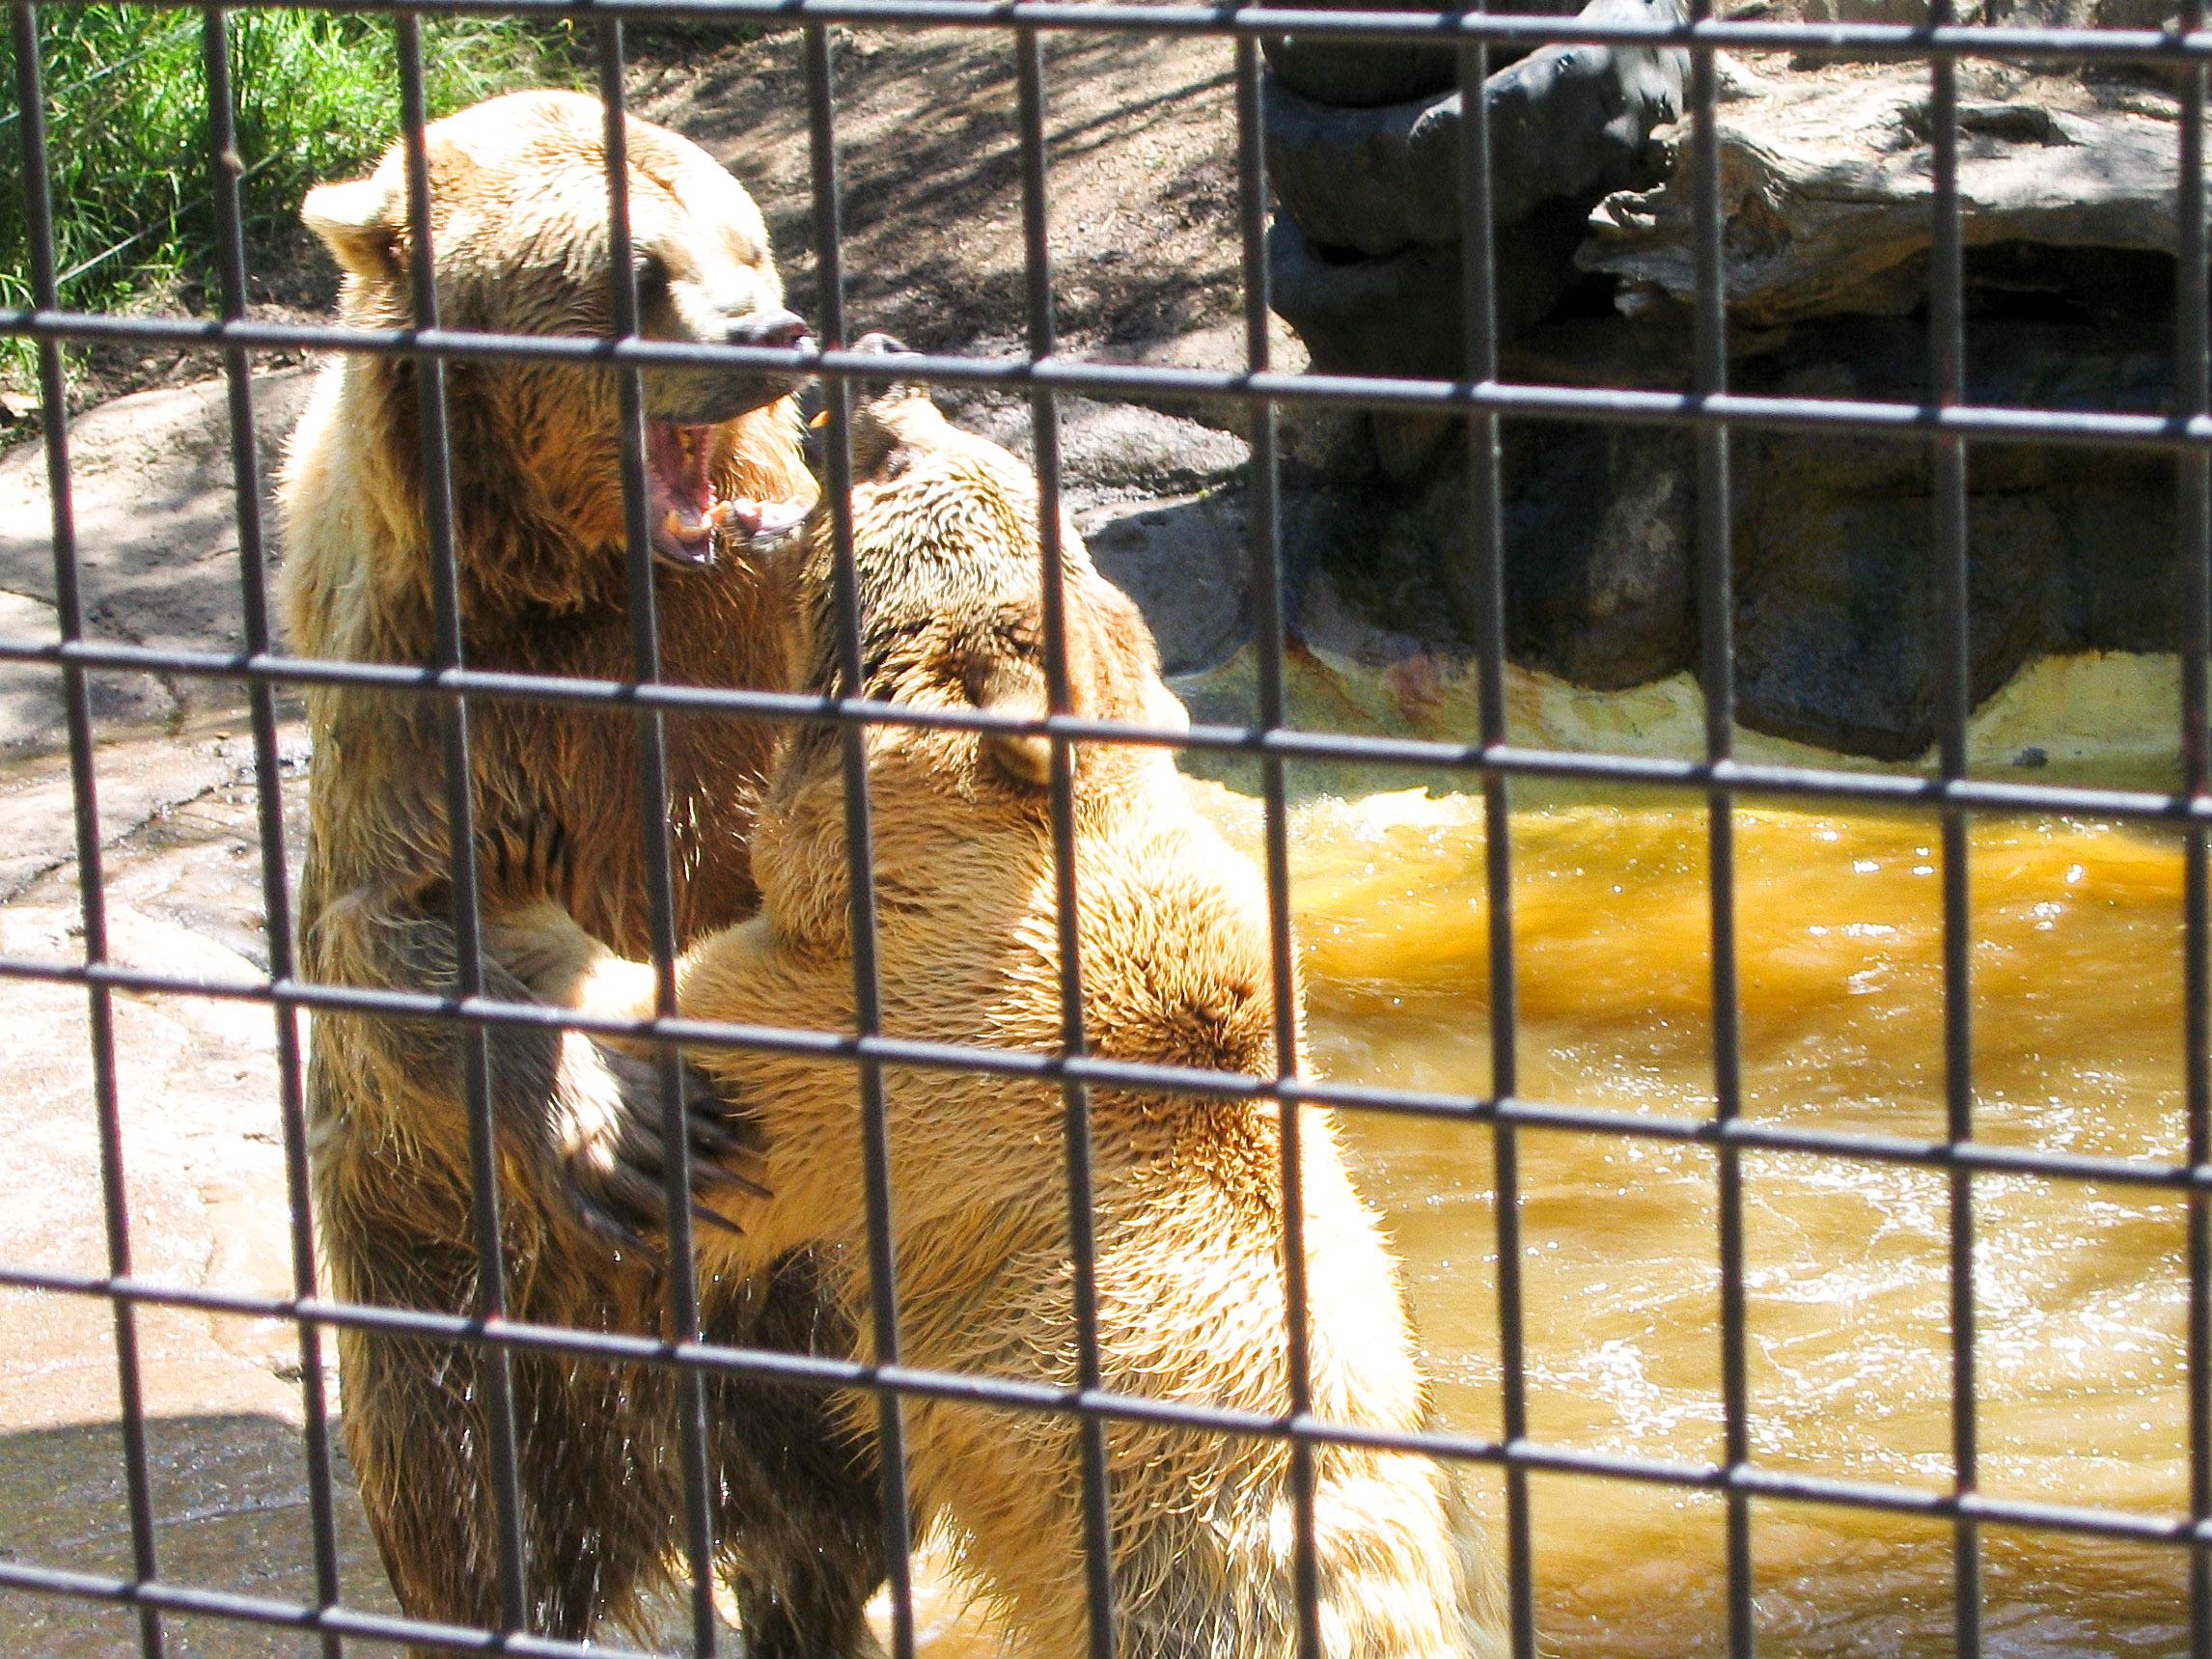 mogo zoo - photo #34